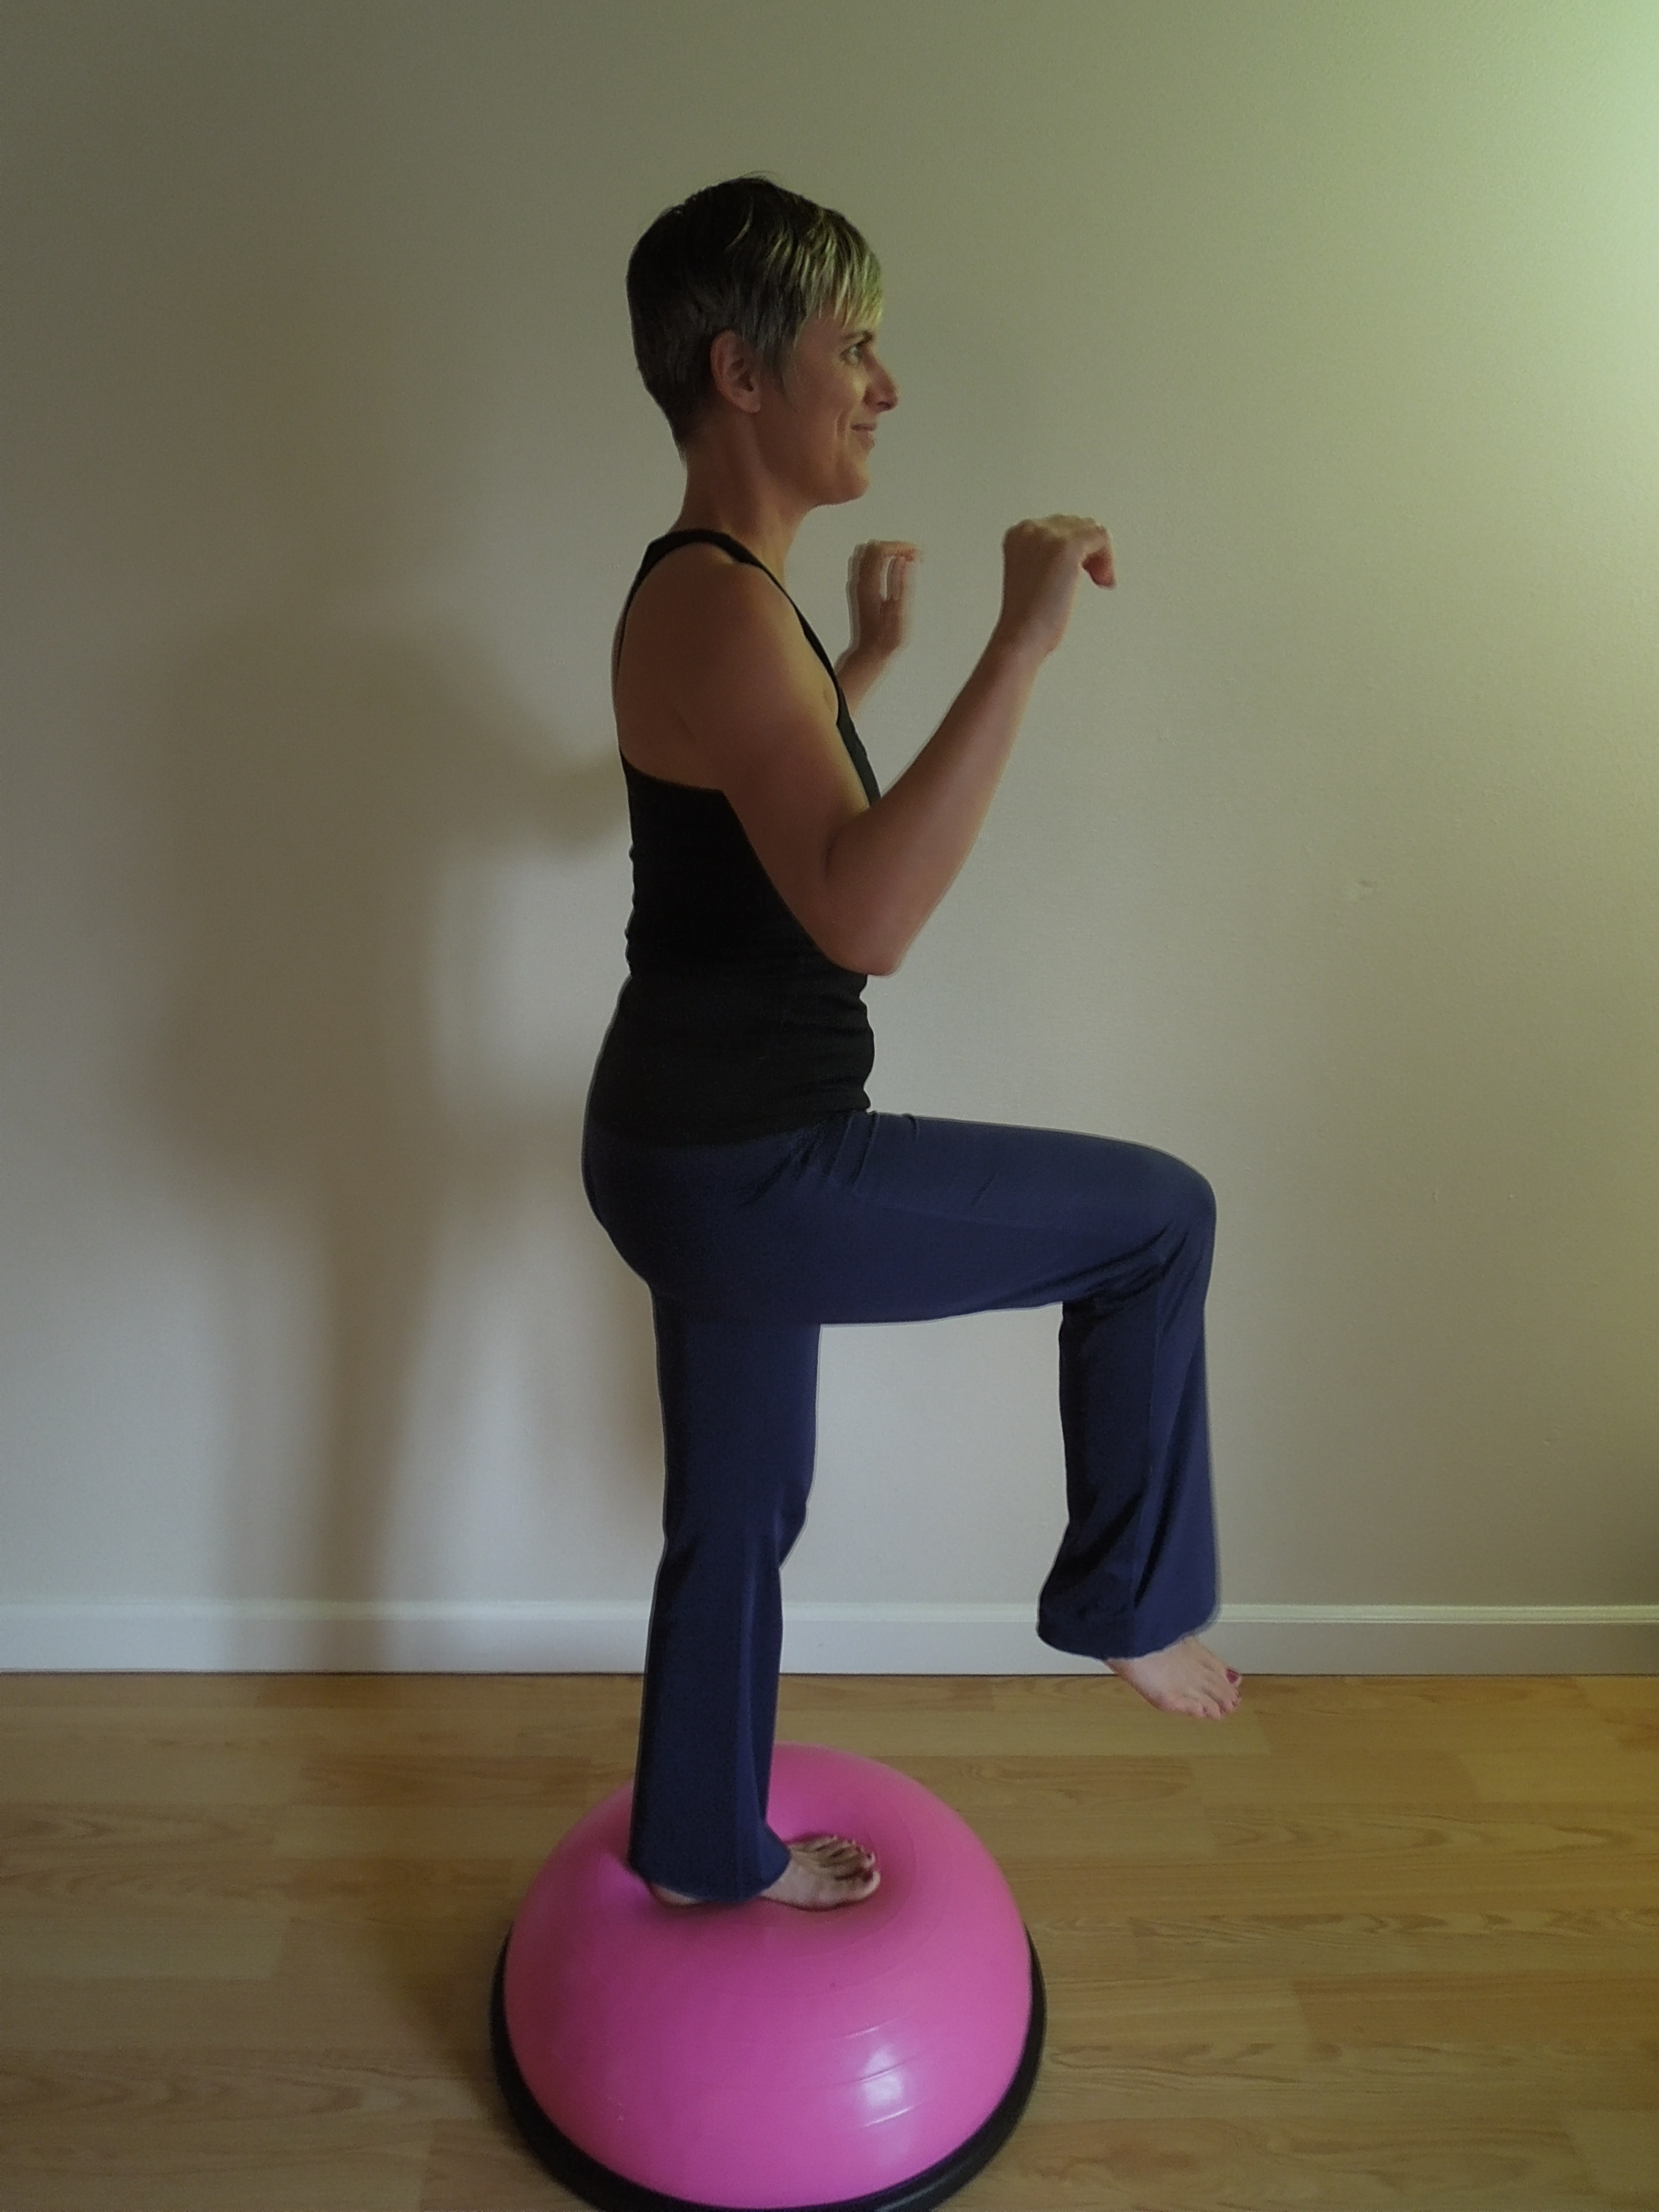 Anne step up 2 8 17 | Fluid Movement + Massage